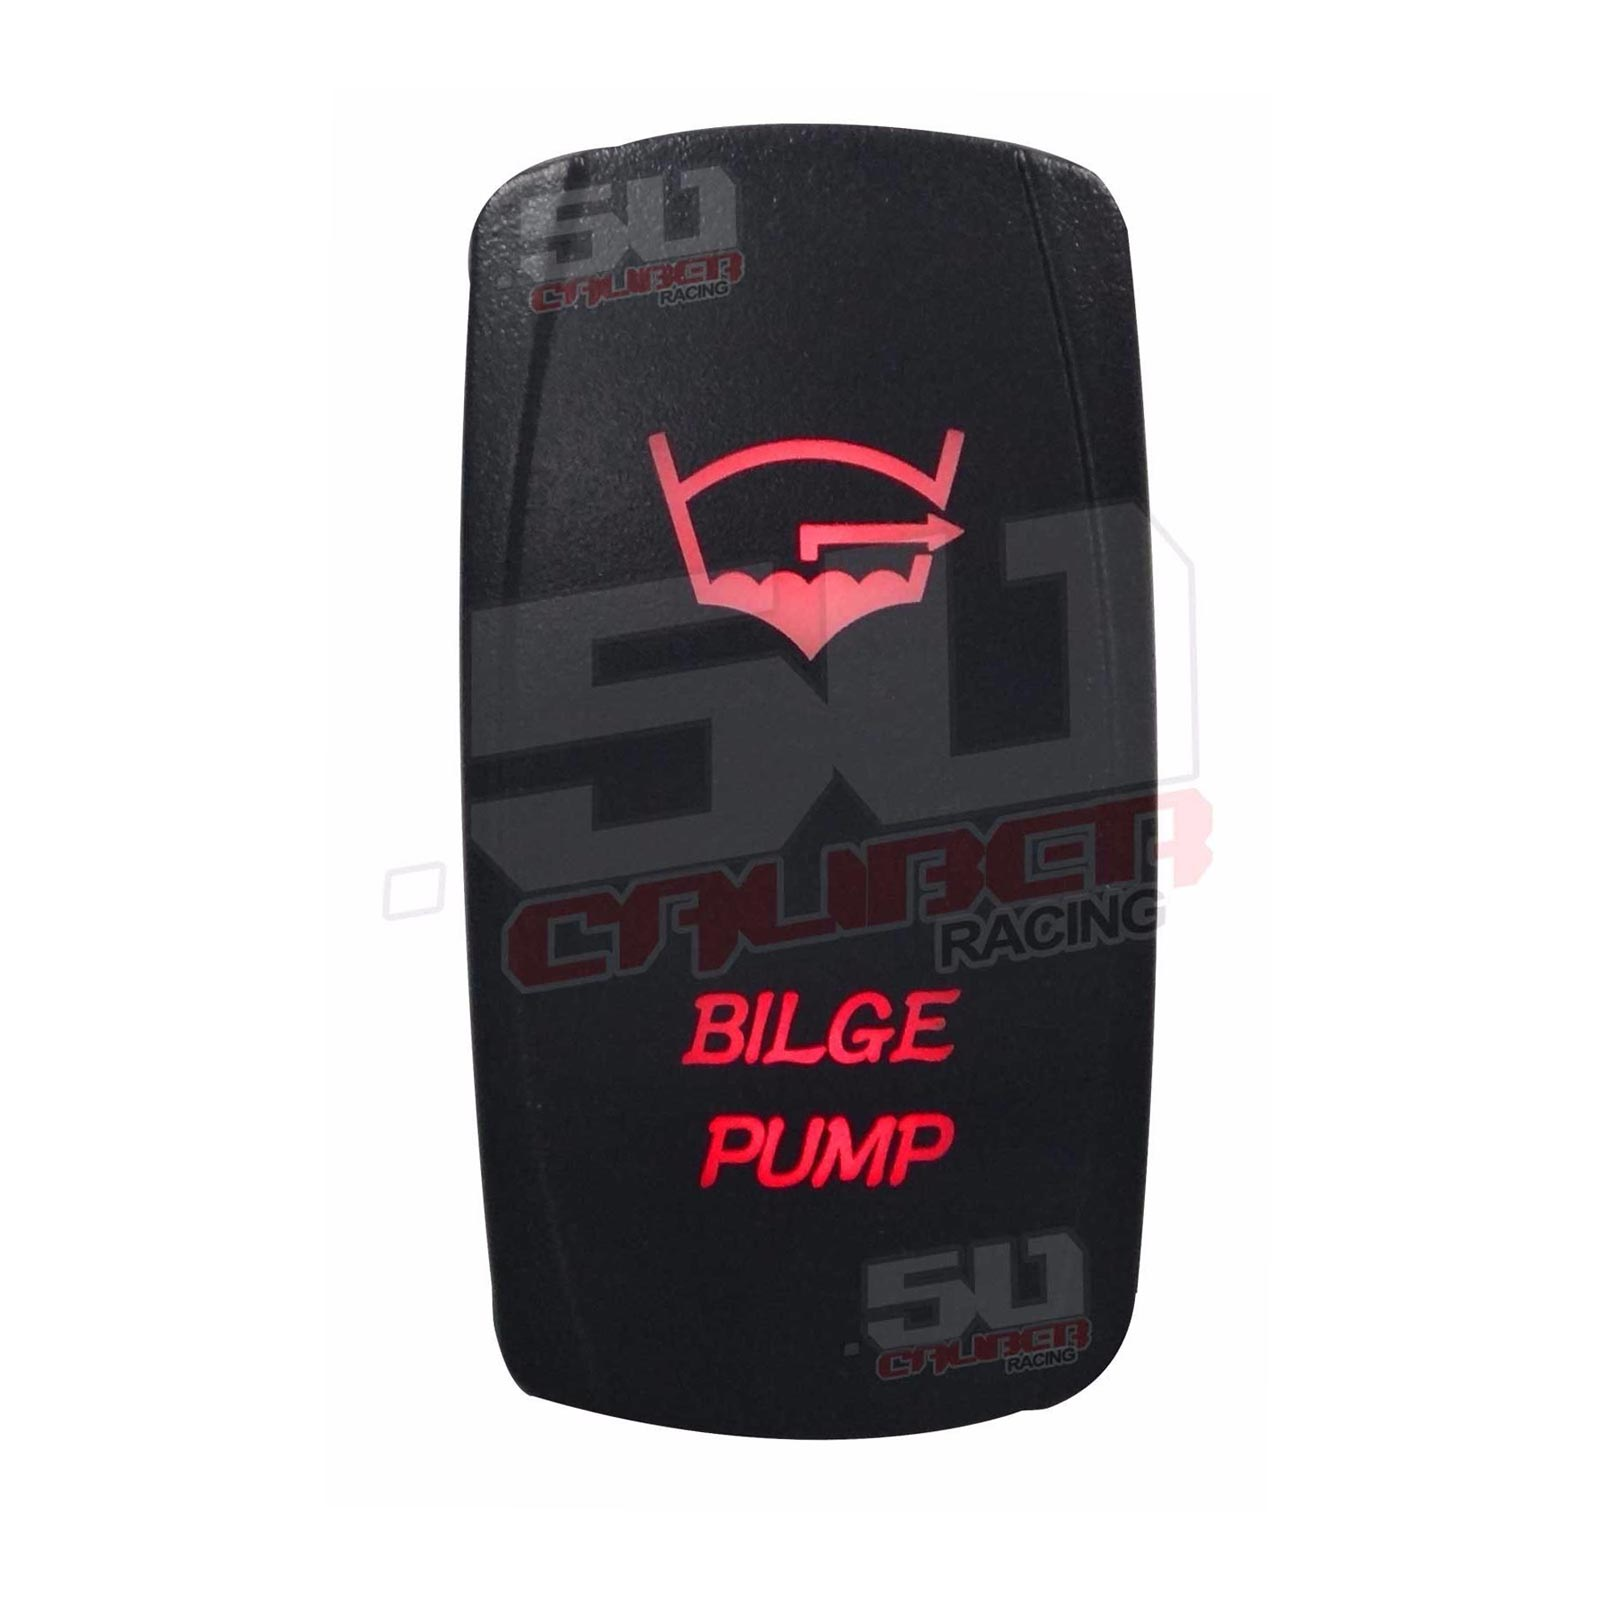 Led Illuminated Rocker Switch Bilge Pump Utv Rzr Teryx Maverick X3 Lighted Red 50 Caliber Racing On Off Waterproof 20 Amp 12 Volt Custom